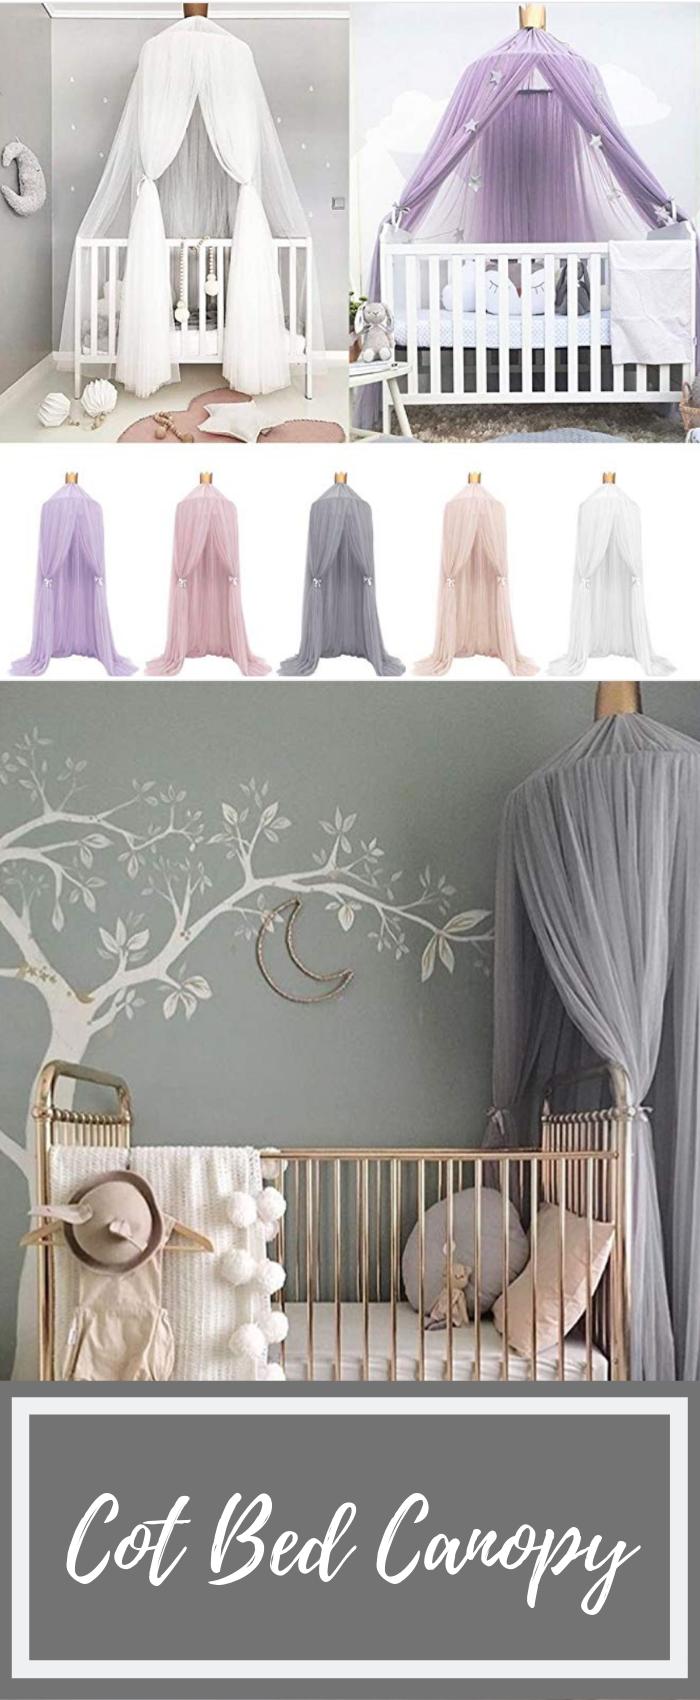 - Princess Bed Canopy Mosquito Net Princess Canopy Bed, Princess